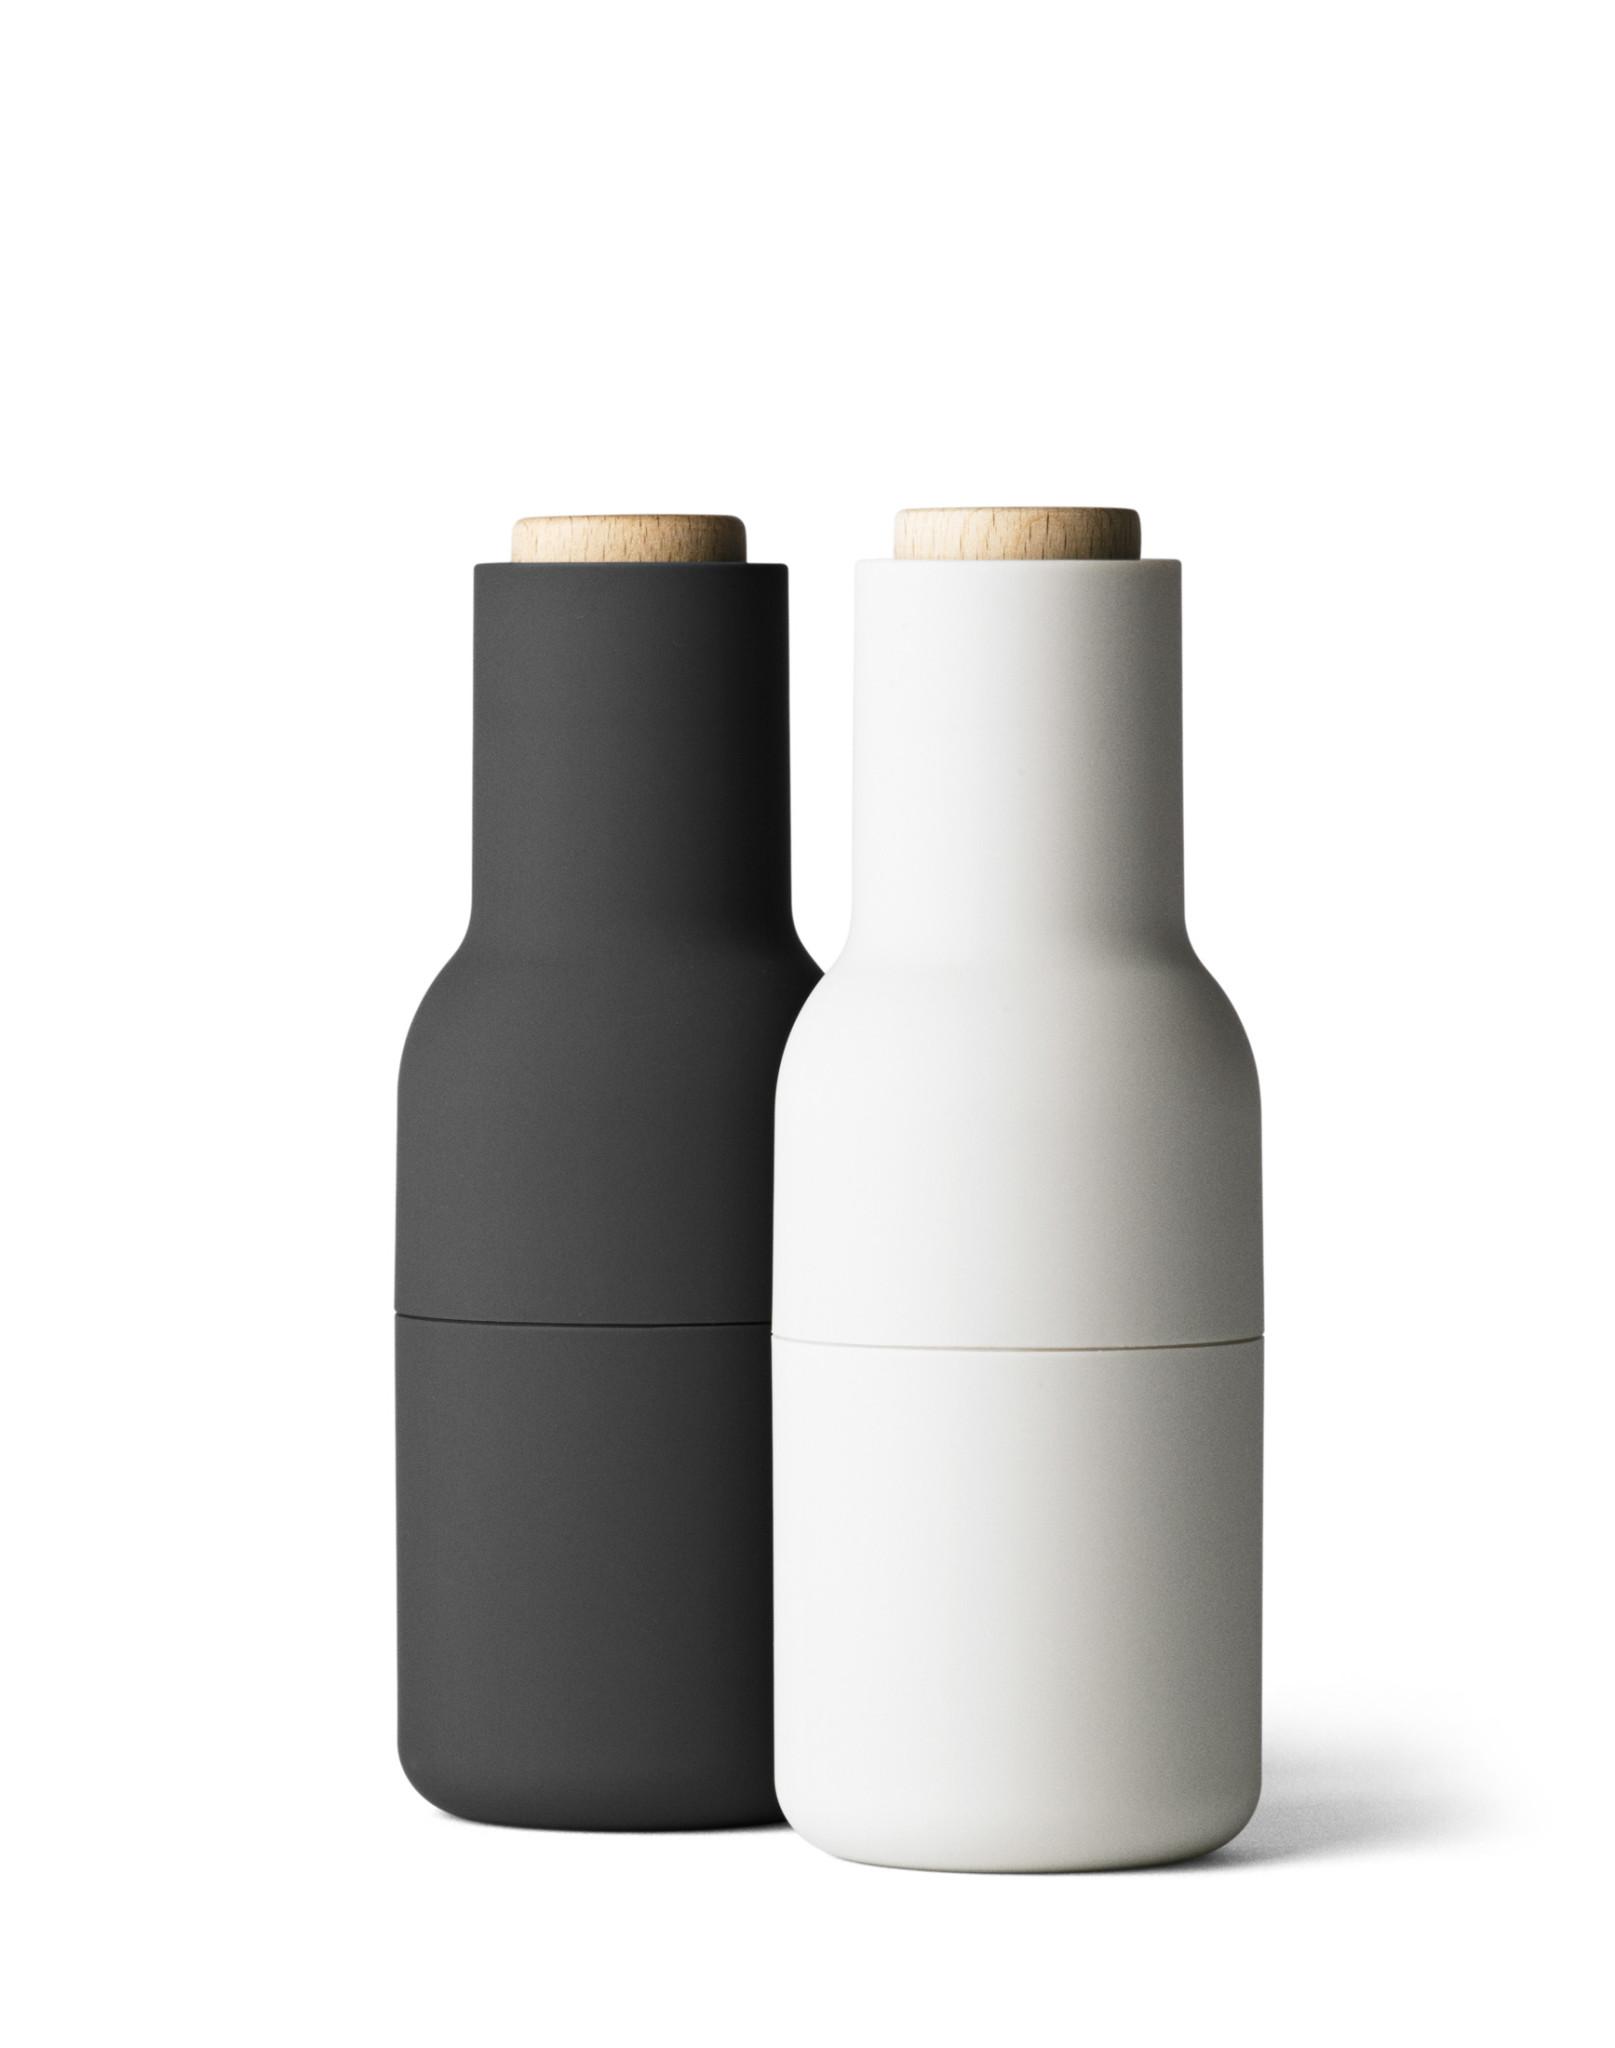 4418399_Bottle Grinder_Small_Ash Carbon_NORM_01_High Res 300dpi JPG (RGB)_409266